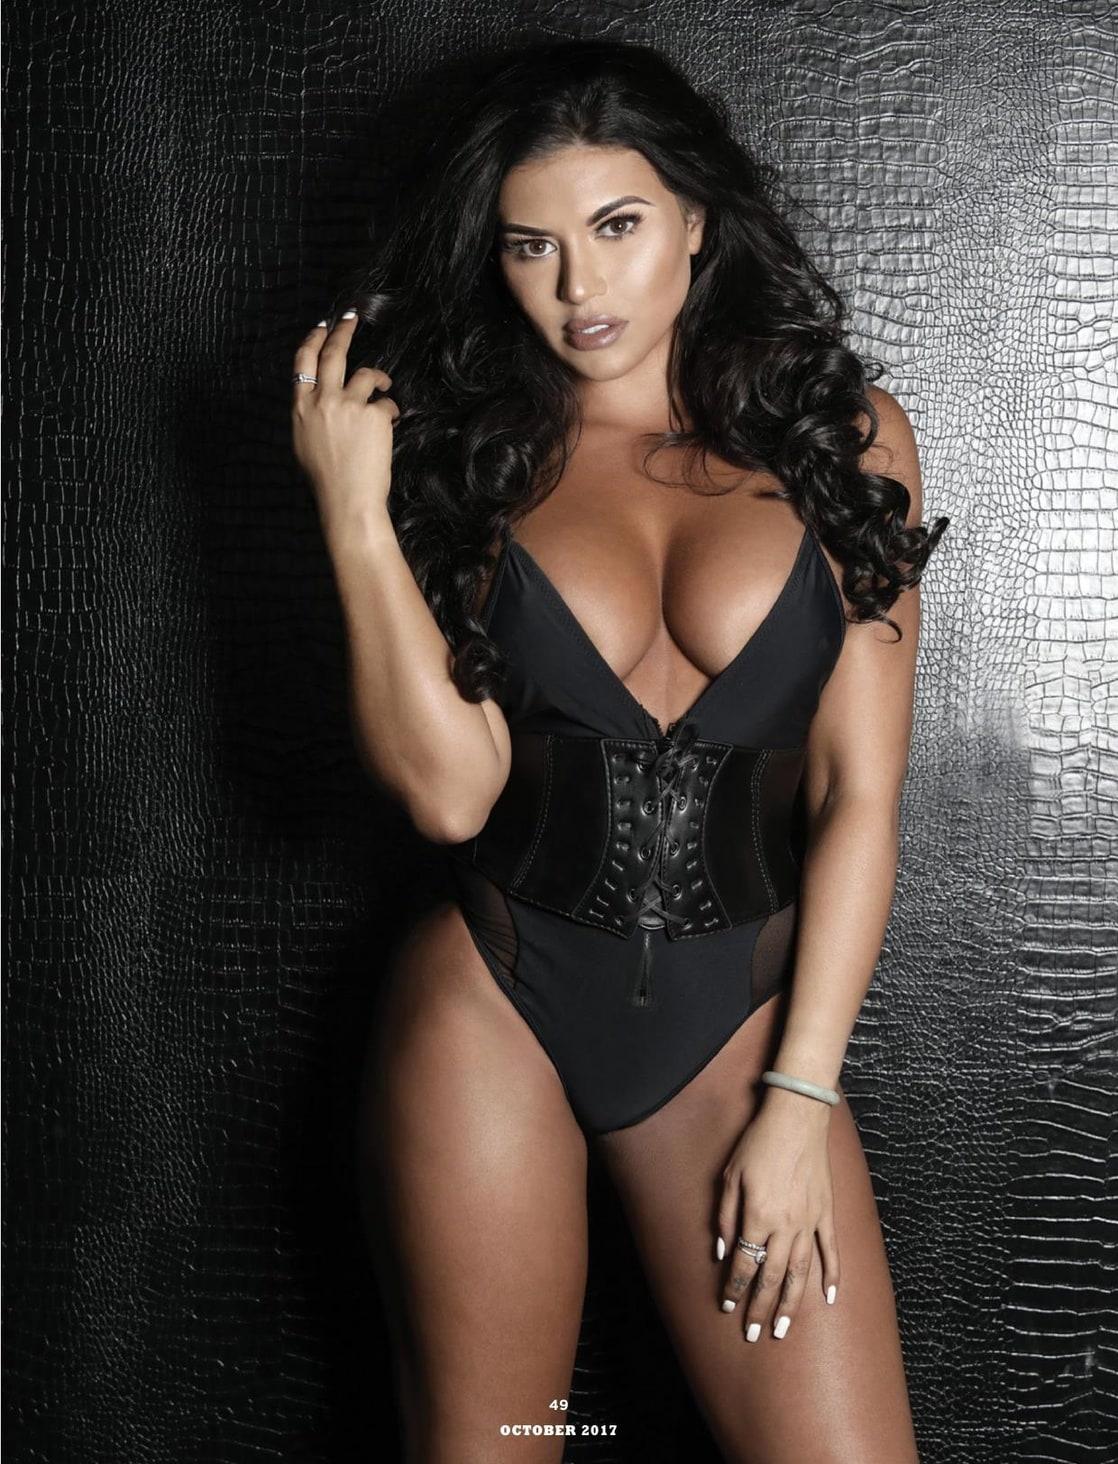 2019 Toochi Kash nudes (97 foto and video), Ass, Sideboobs, Instagram, braless 2015